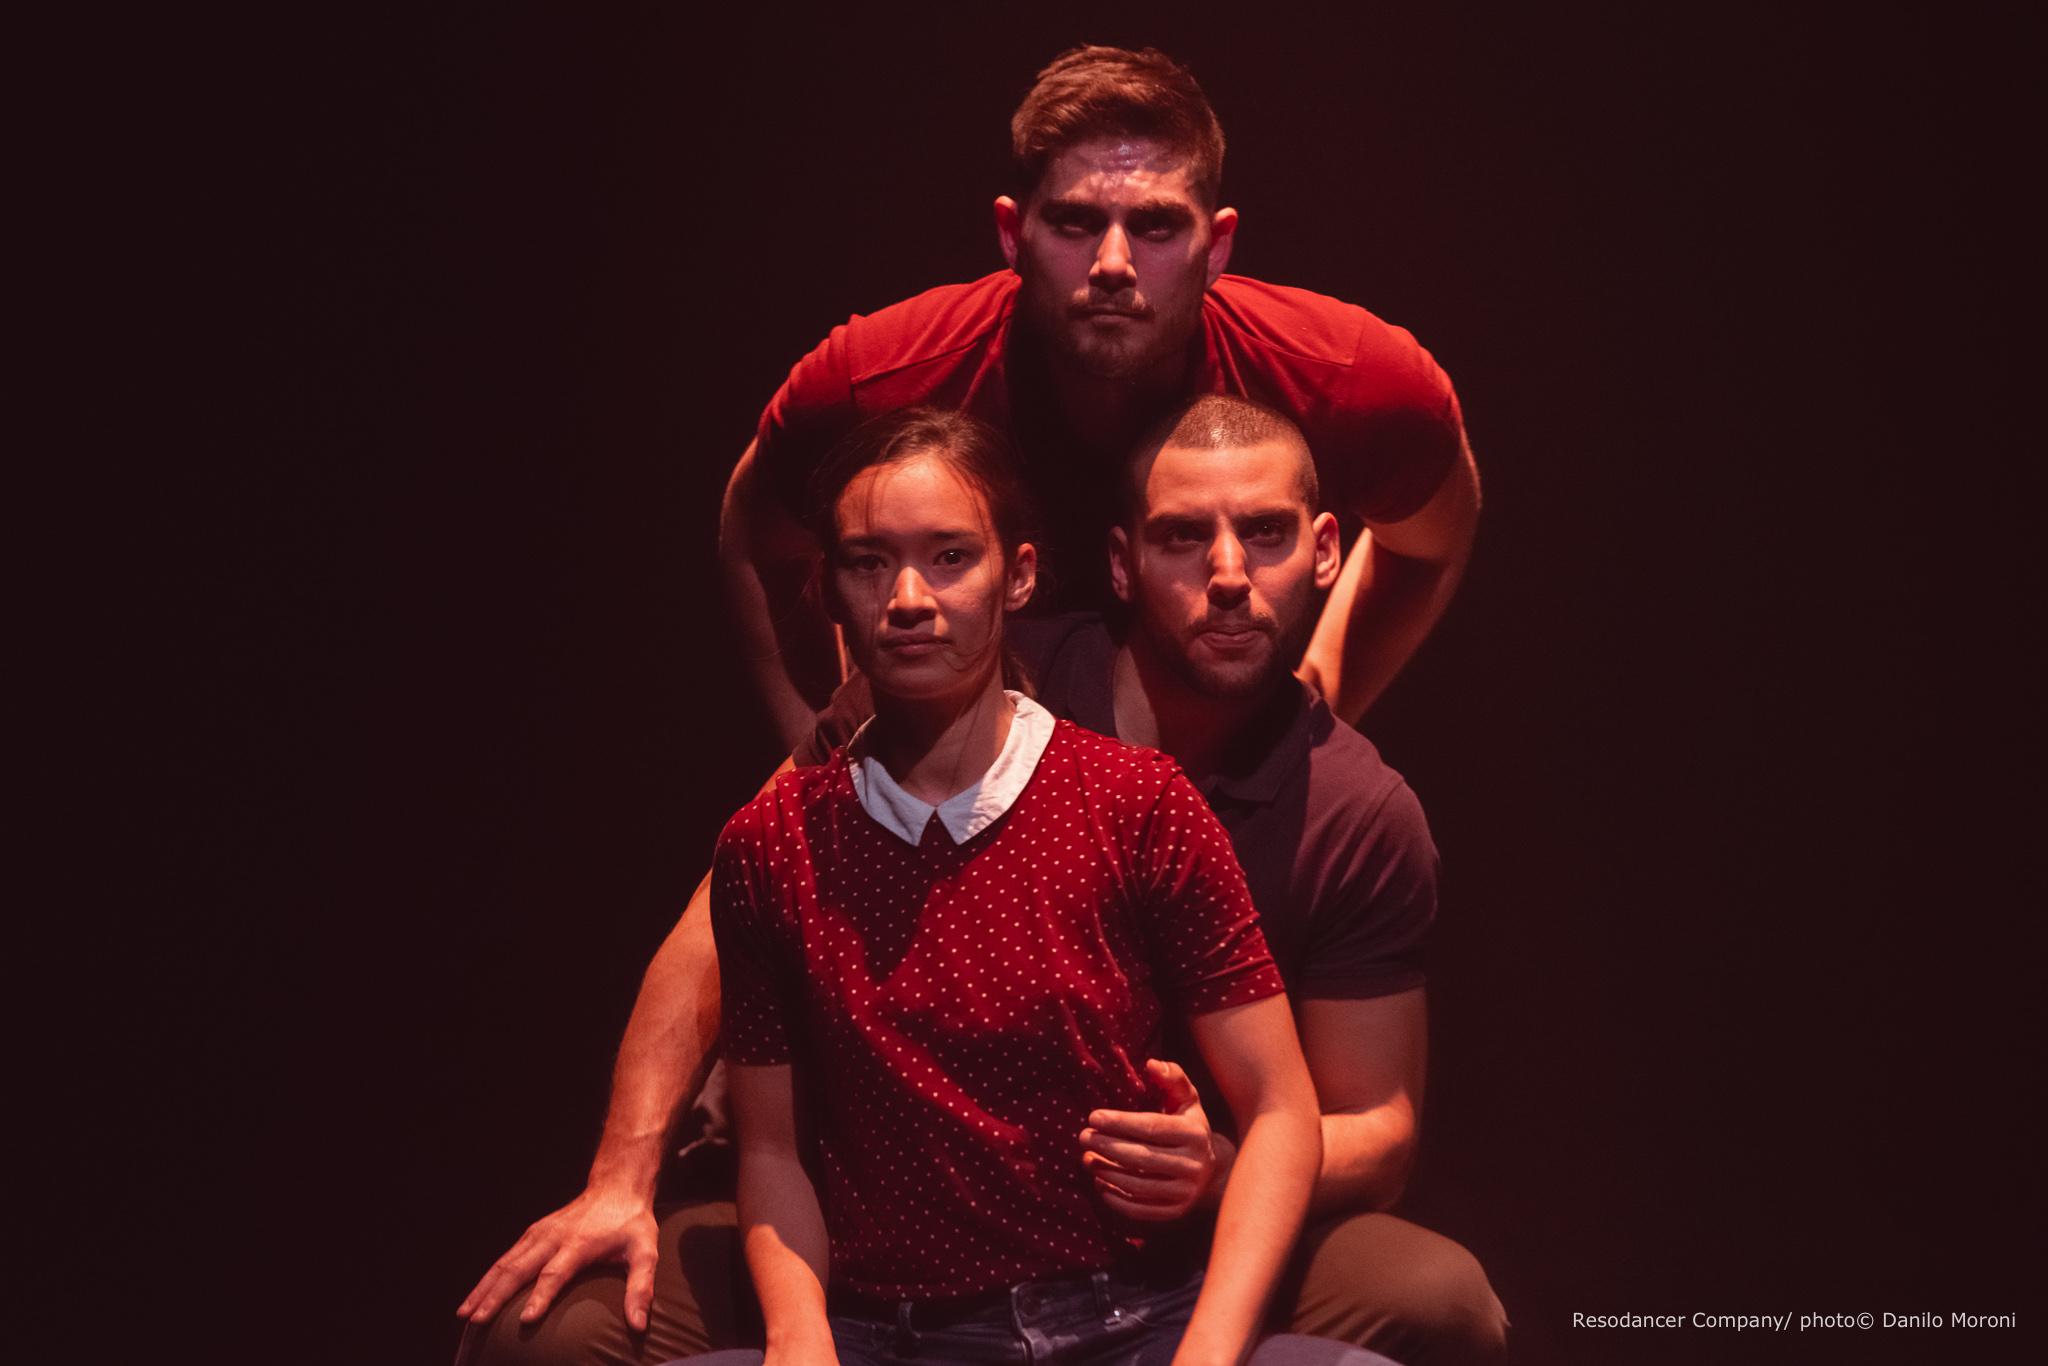 Image of Resodancer performing at Teatros del Canal dance photography, fotografia de escena, fotografo de danza, dance photographer, stage photography